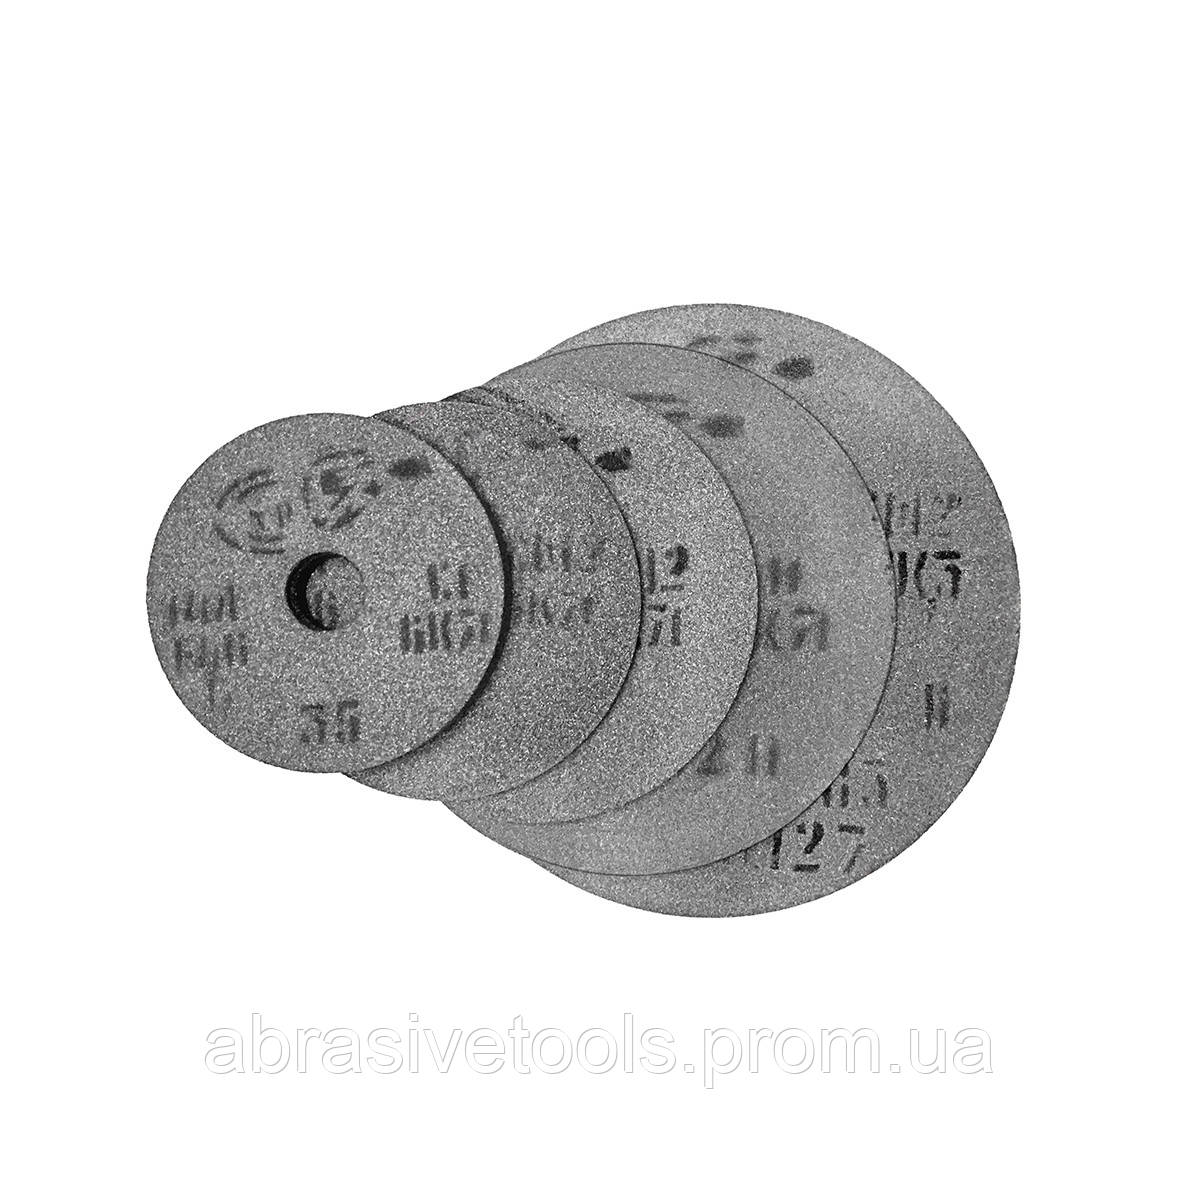 Круг шлифовальный 175х16х32  F46 СМ2